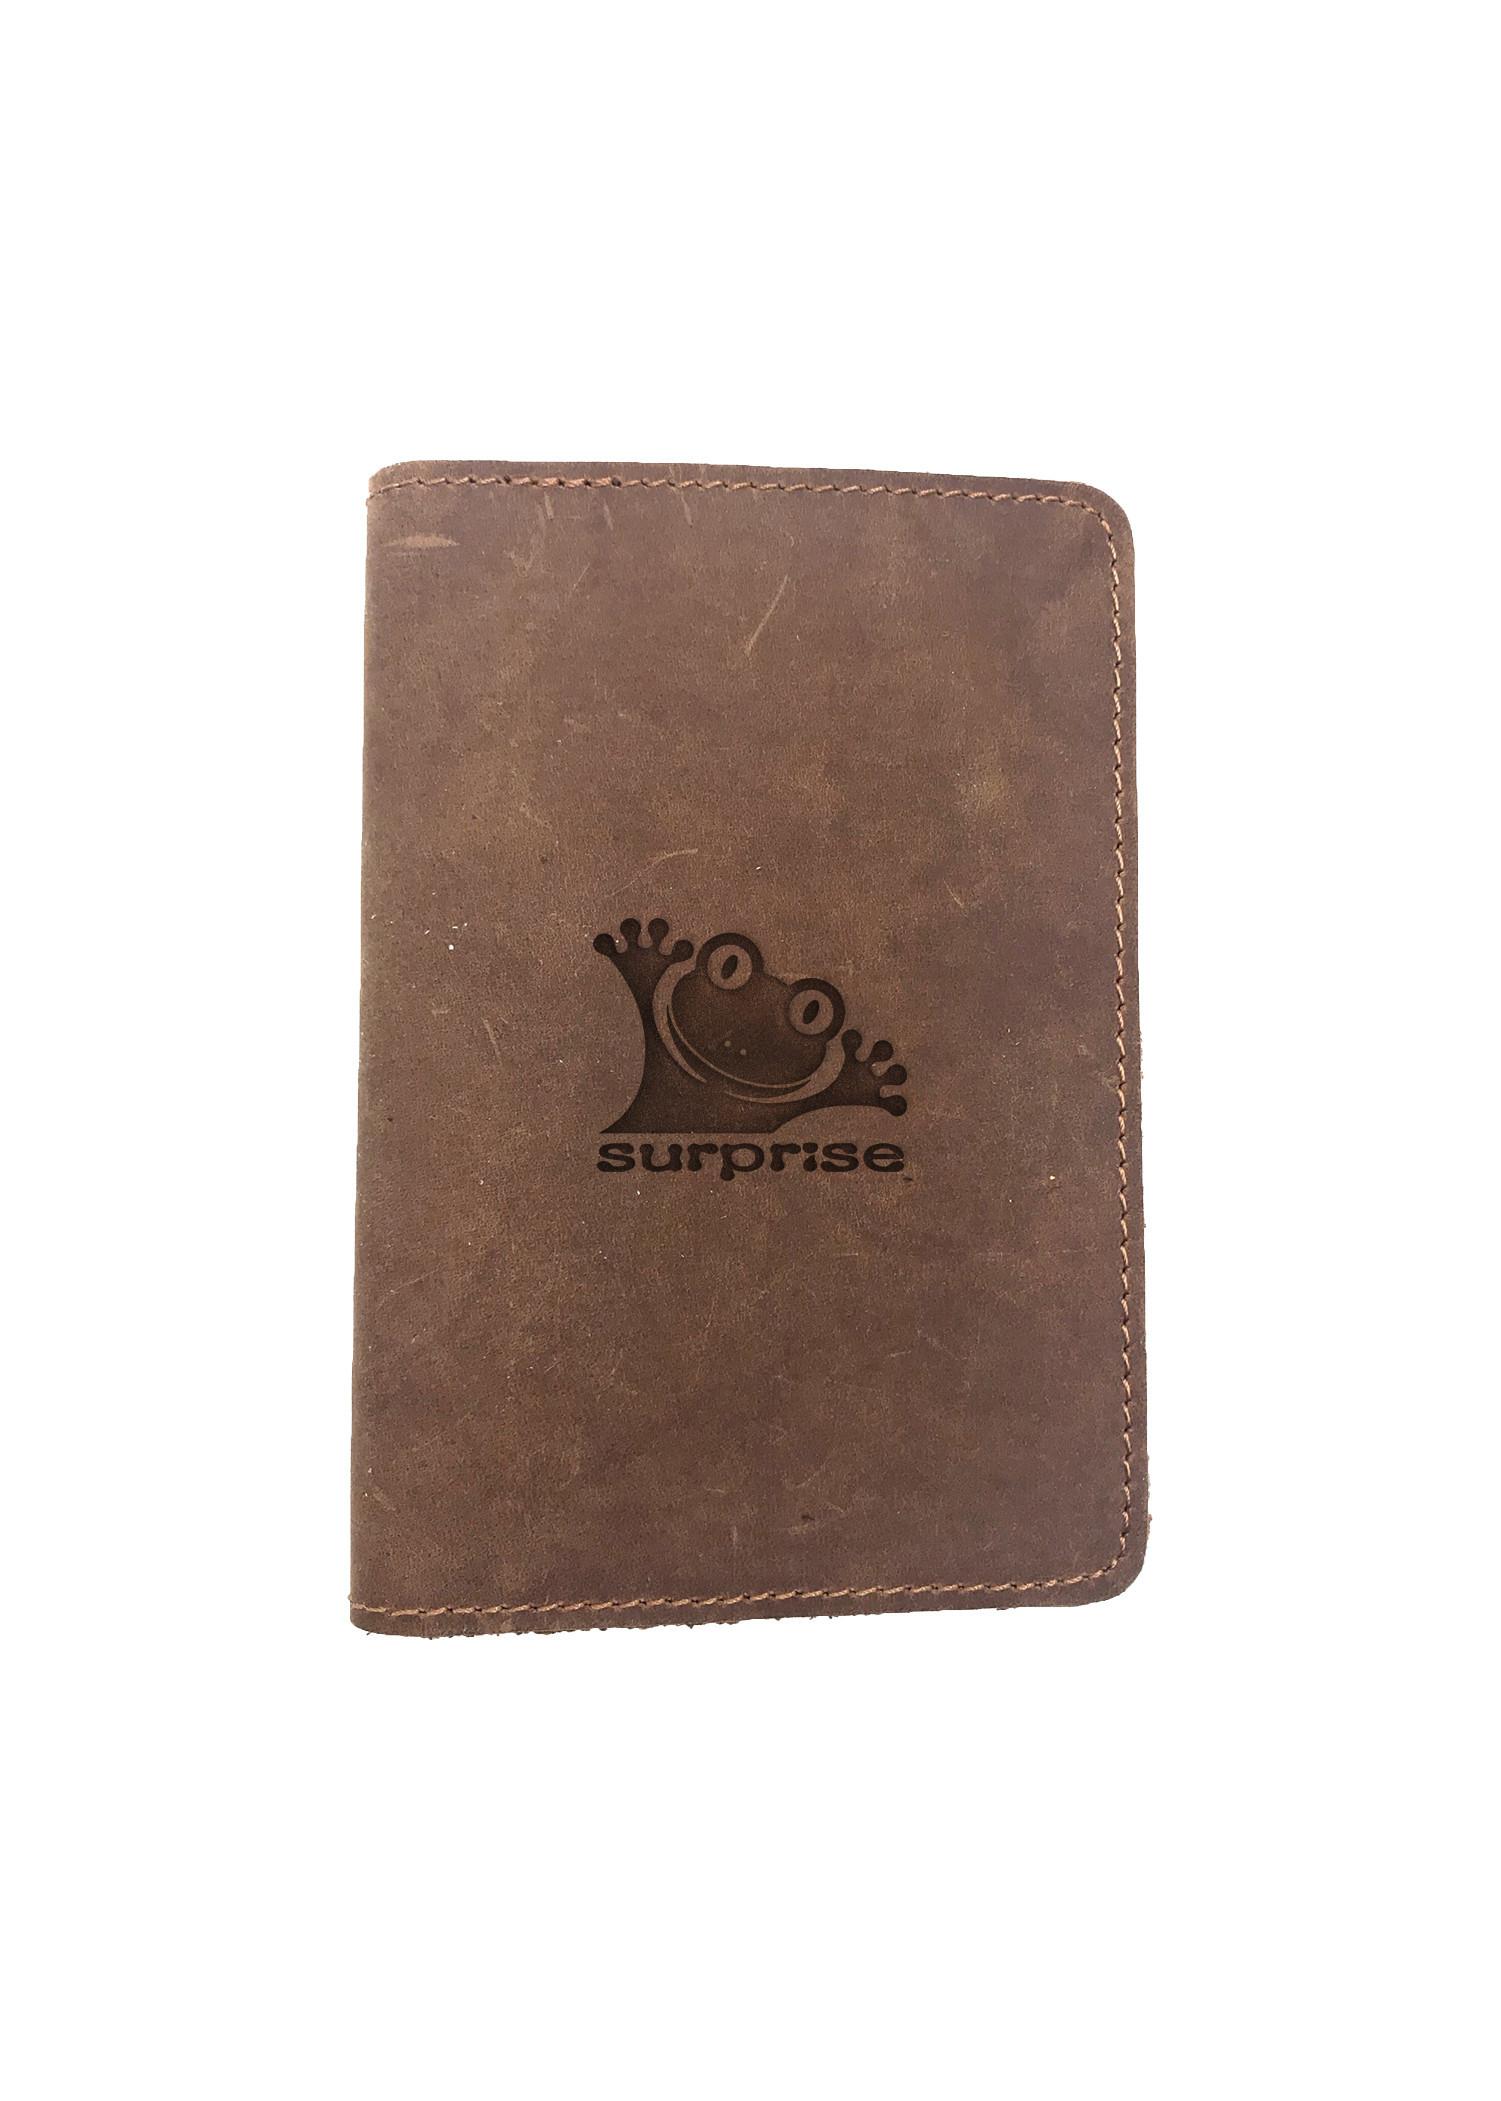 Passport Cover Bao Da Hộ Chiếu Da Sáp Khắc Hình Ếch FROG SURPRISE (BROWN)